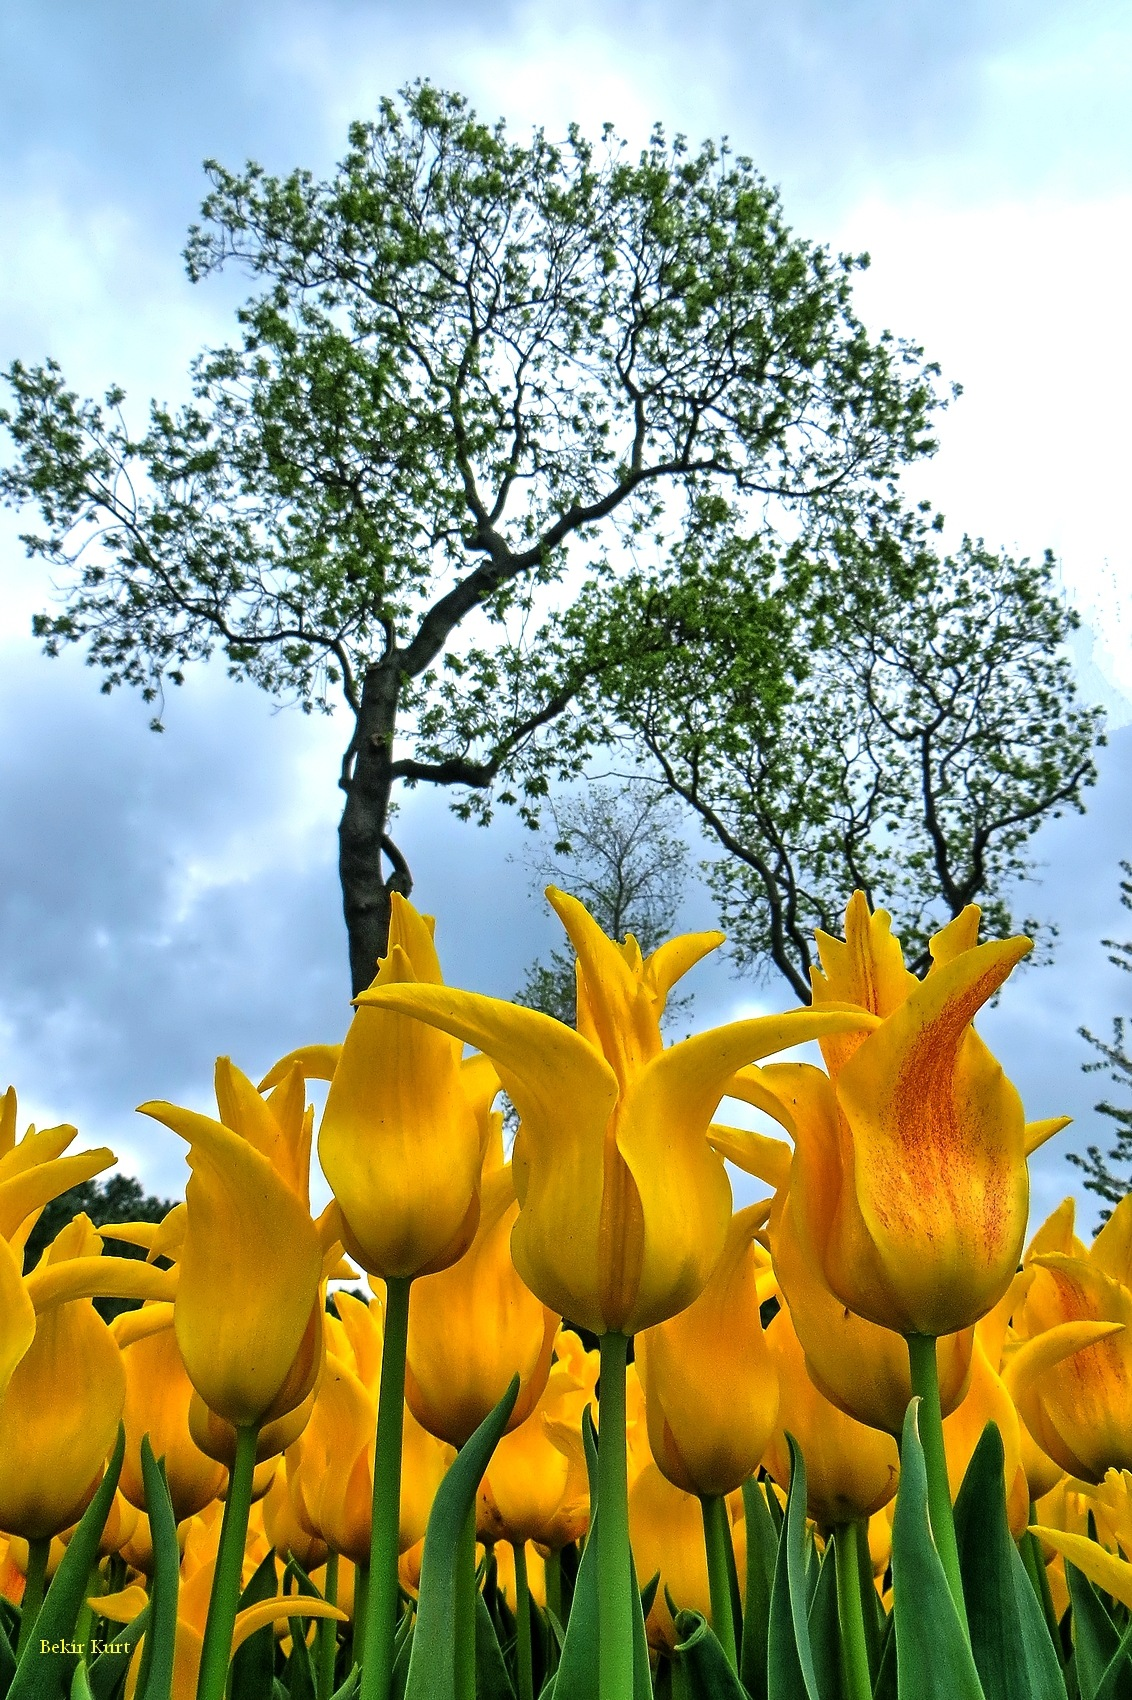 Tulips From Emirgan (2) by Bekir Kurt